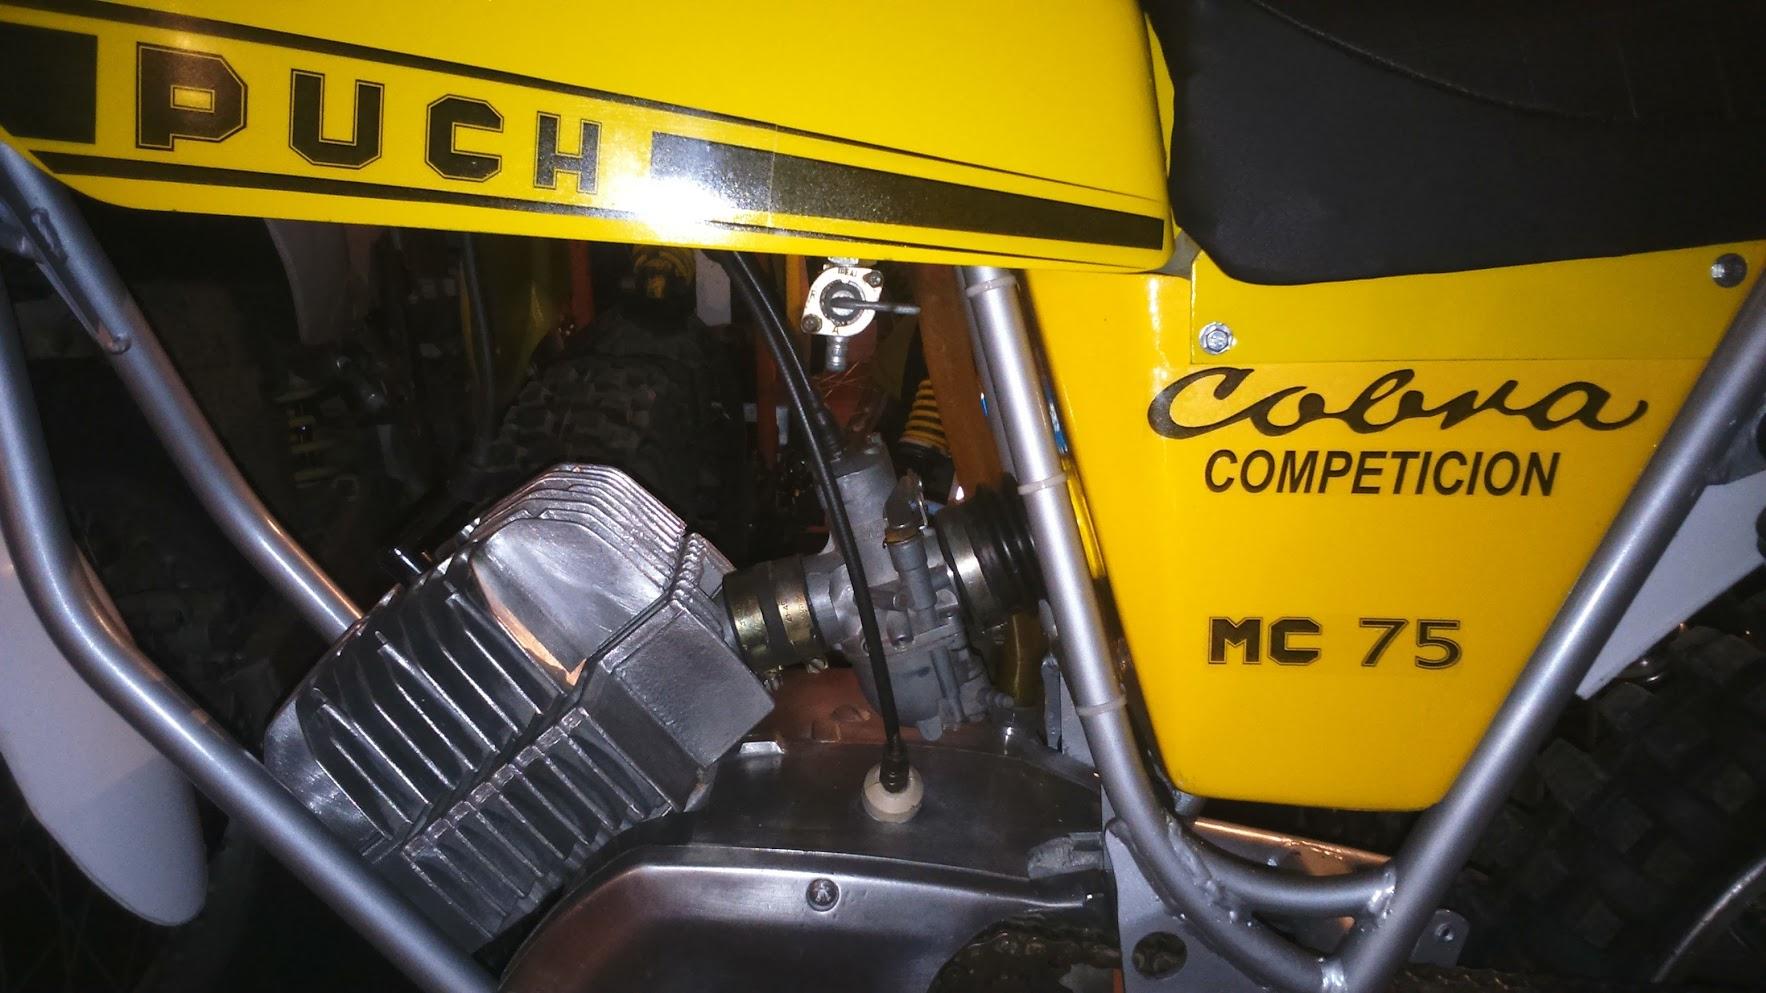 cobra - Puch Cobra MC75 convertida a MC75 Cross * Jce2 TG3fx8Jskl3_4hOM7fEpI-SxGkK4ANhI7sNGwGzqbhg=w1766-h993-no